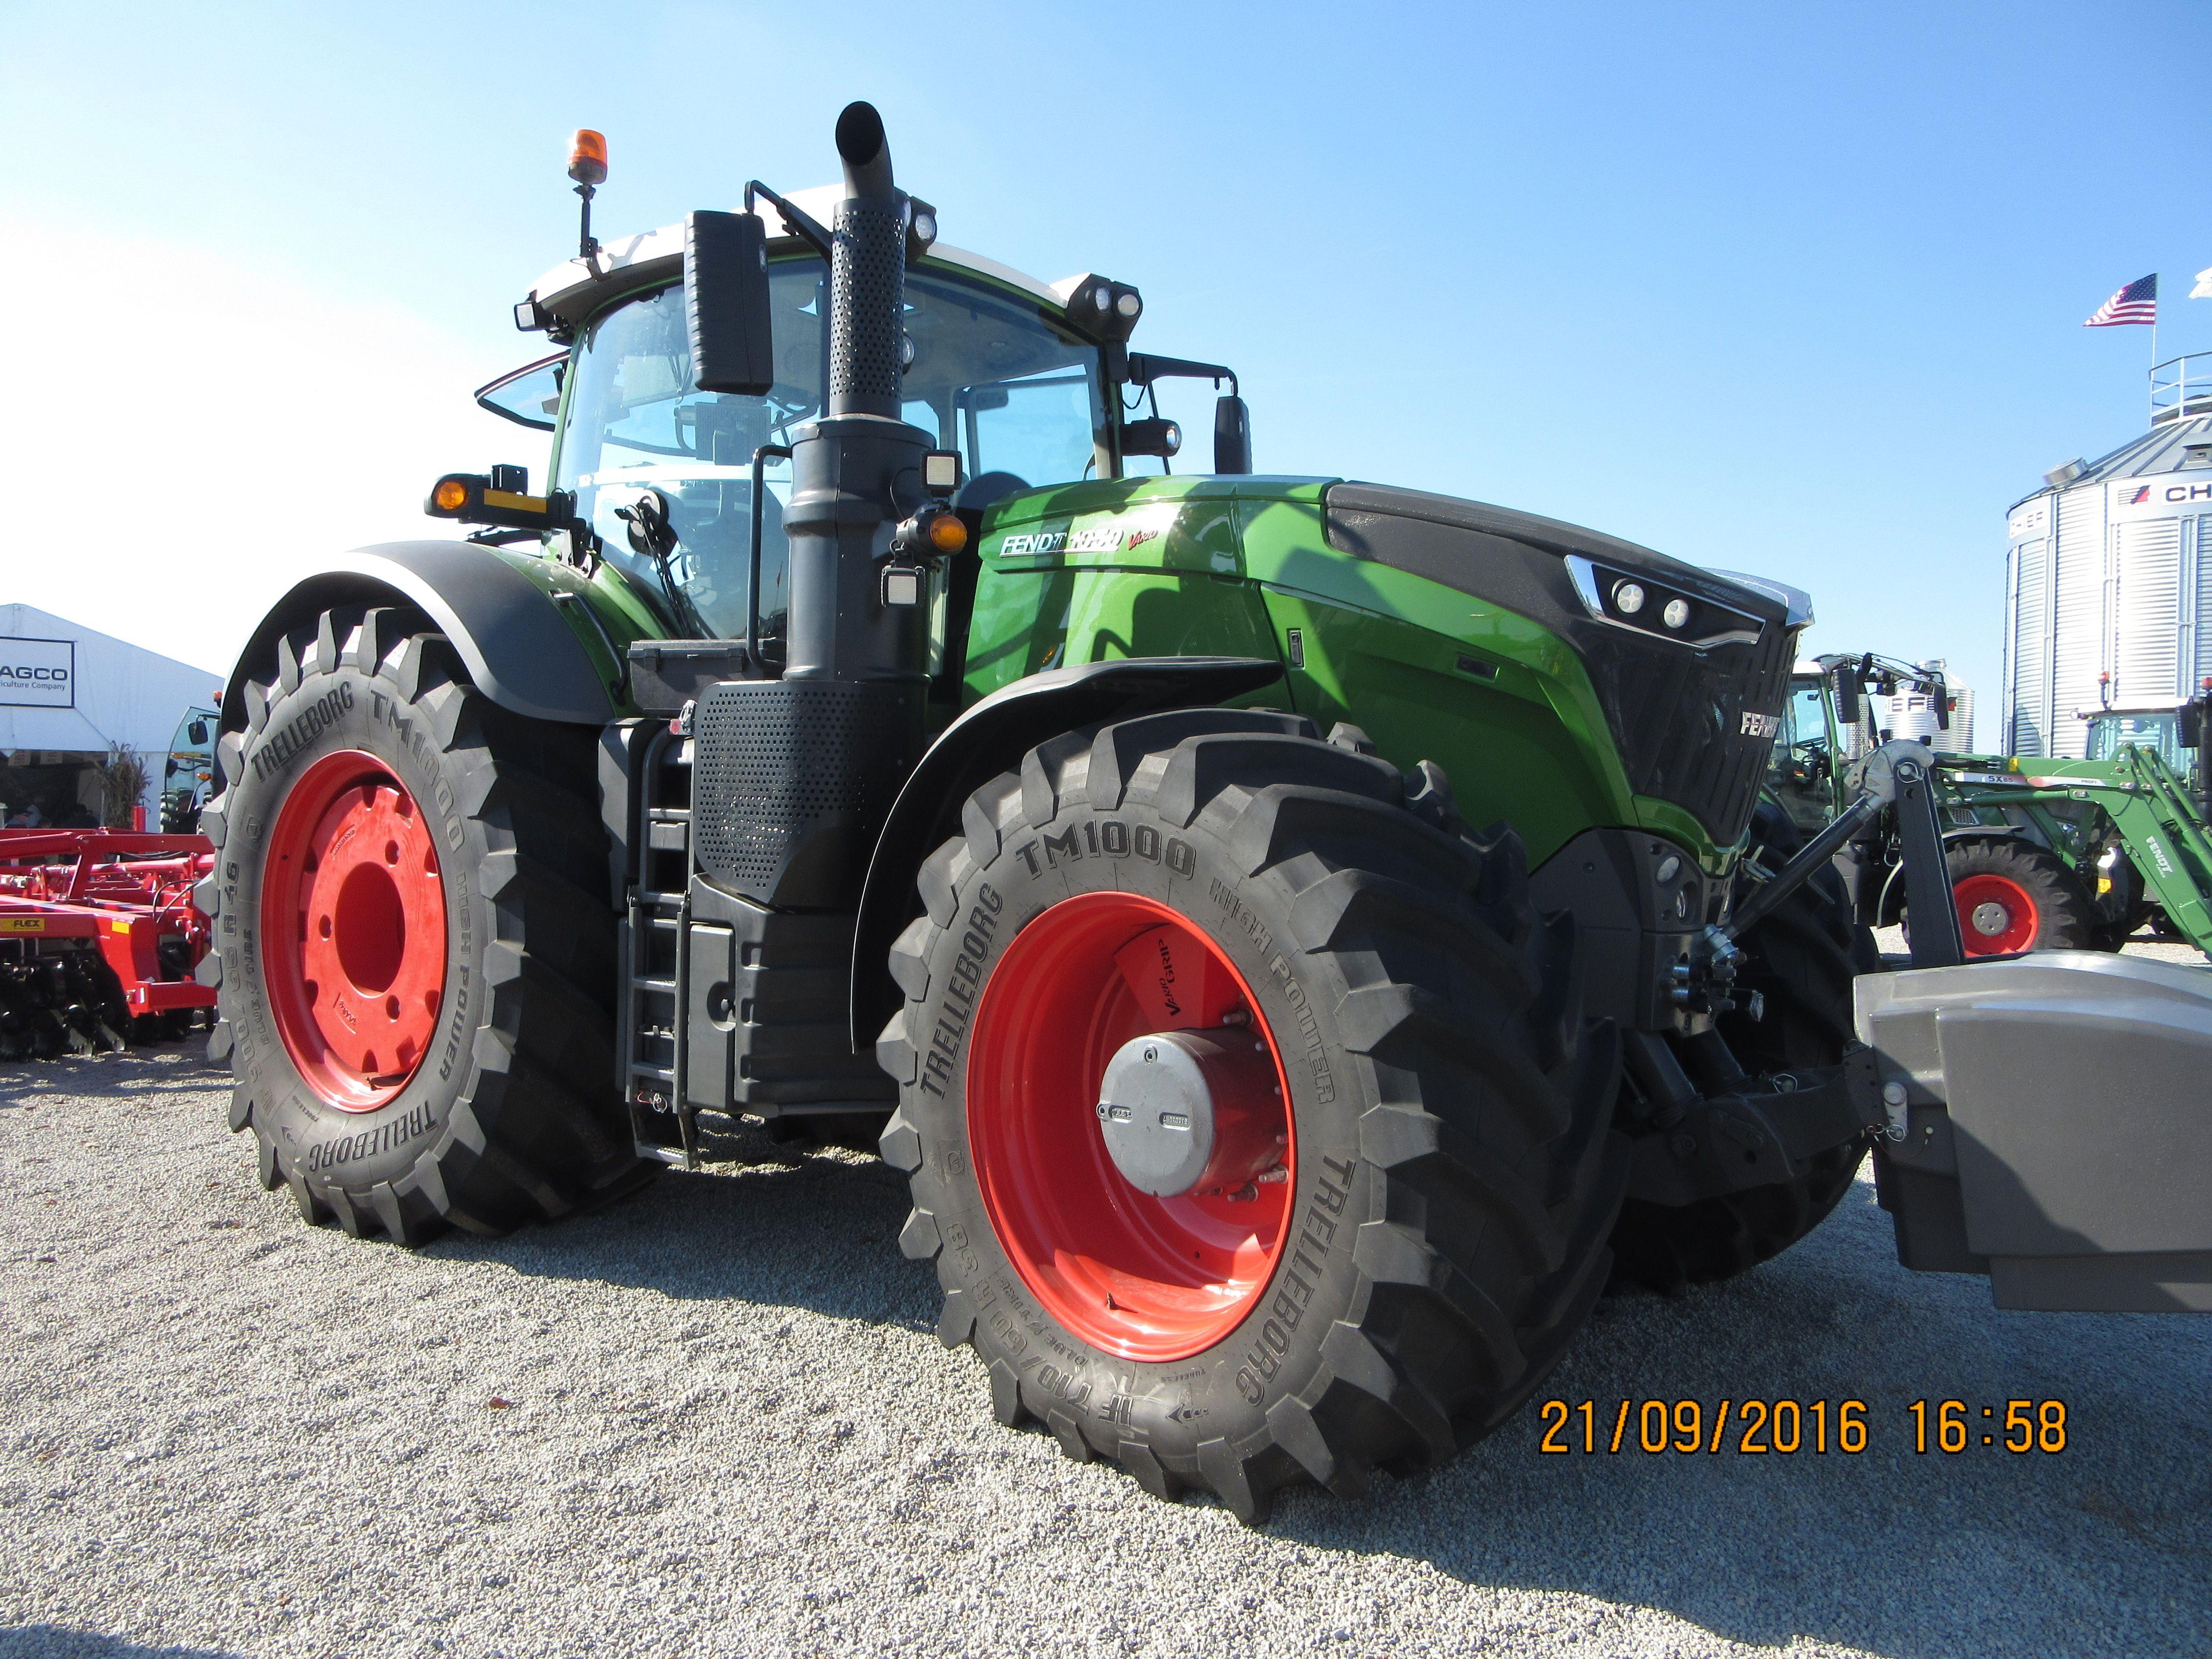 Traktor Ausmalbilder Fendt : Fendt 1050 My Tractor Pictures Pinterest Traktoren